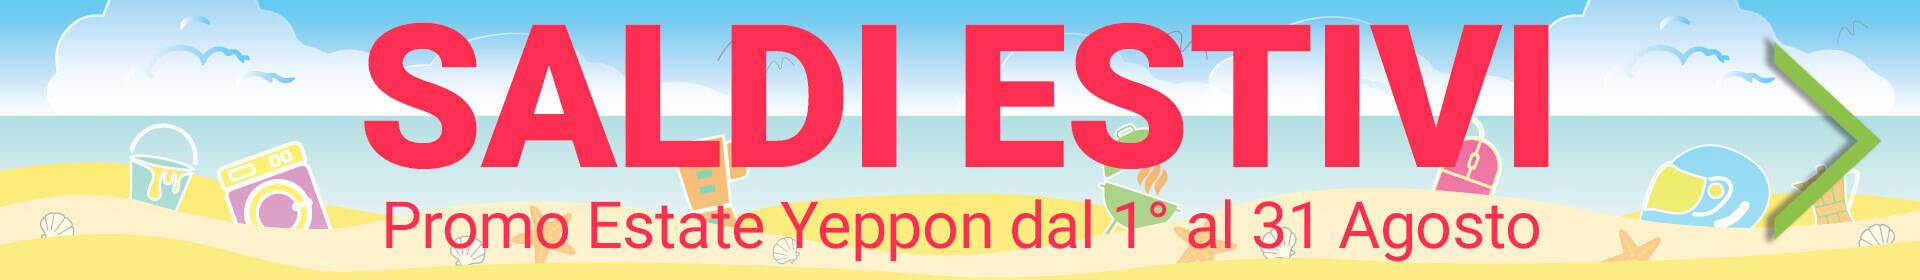 banner yeppon